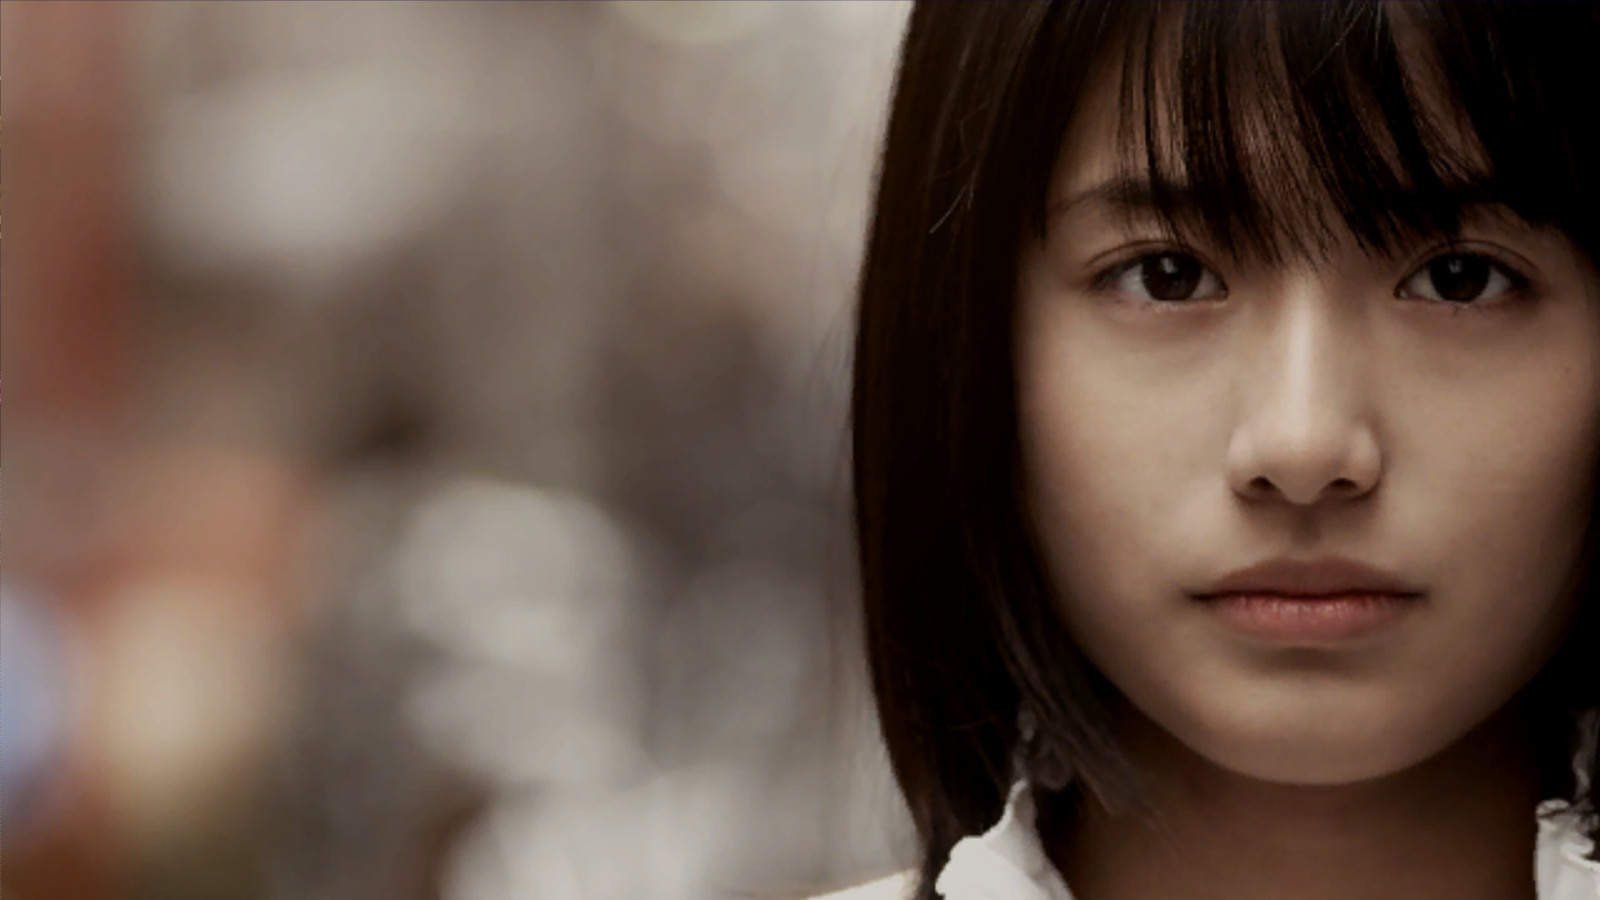 20100420052317.jpg - 市原隼人の元カノは同級生!別れた流れが悲しすぎる…